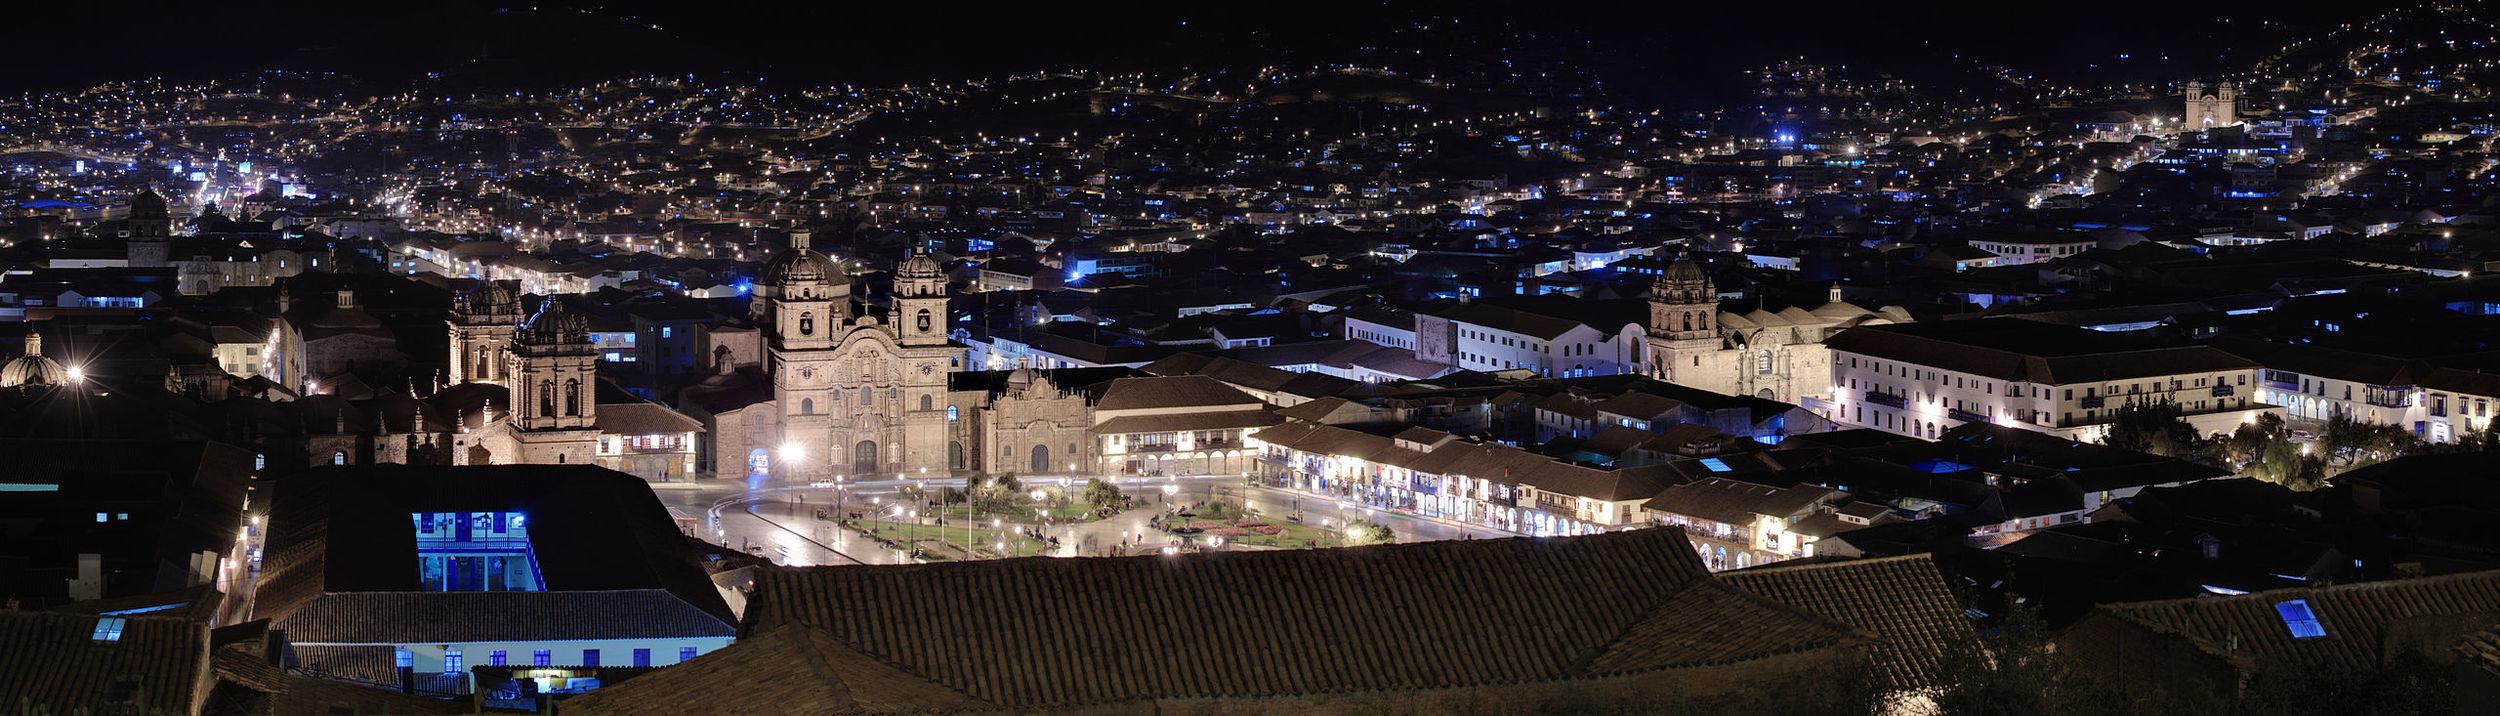 Cusco's Main Square at Night. Photo:Martin St-Amant - Wikipedia